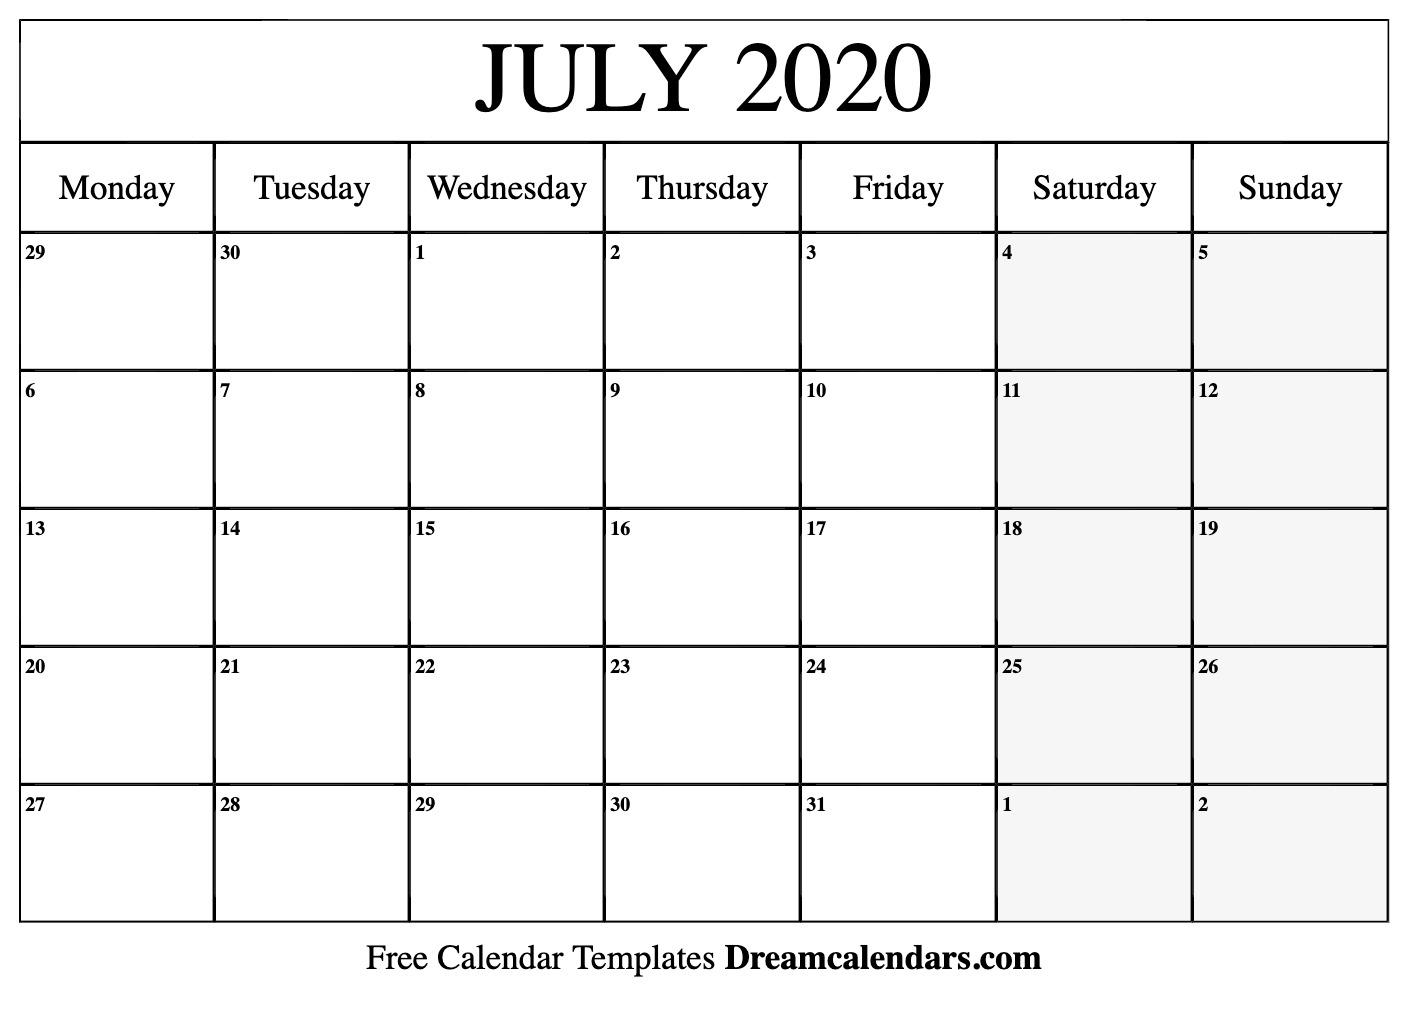 Printable July 2020 Calendar within Printable 2020 Calendar I Can Edit